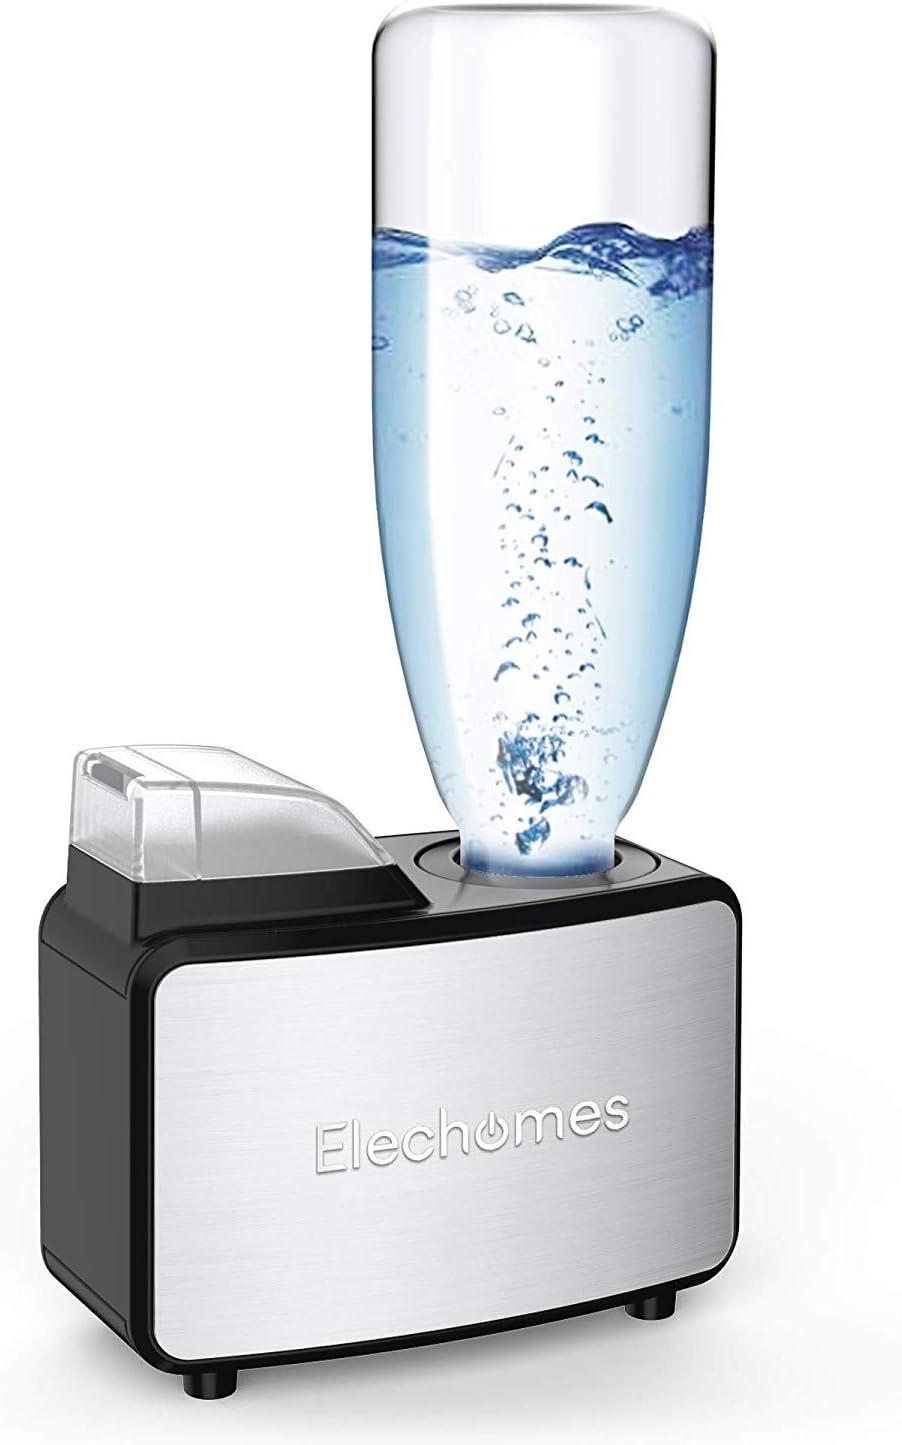 Elechomes UM0001 Ultrasonic shopping Mini Cool P Humidifier Mist Very popular Personal